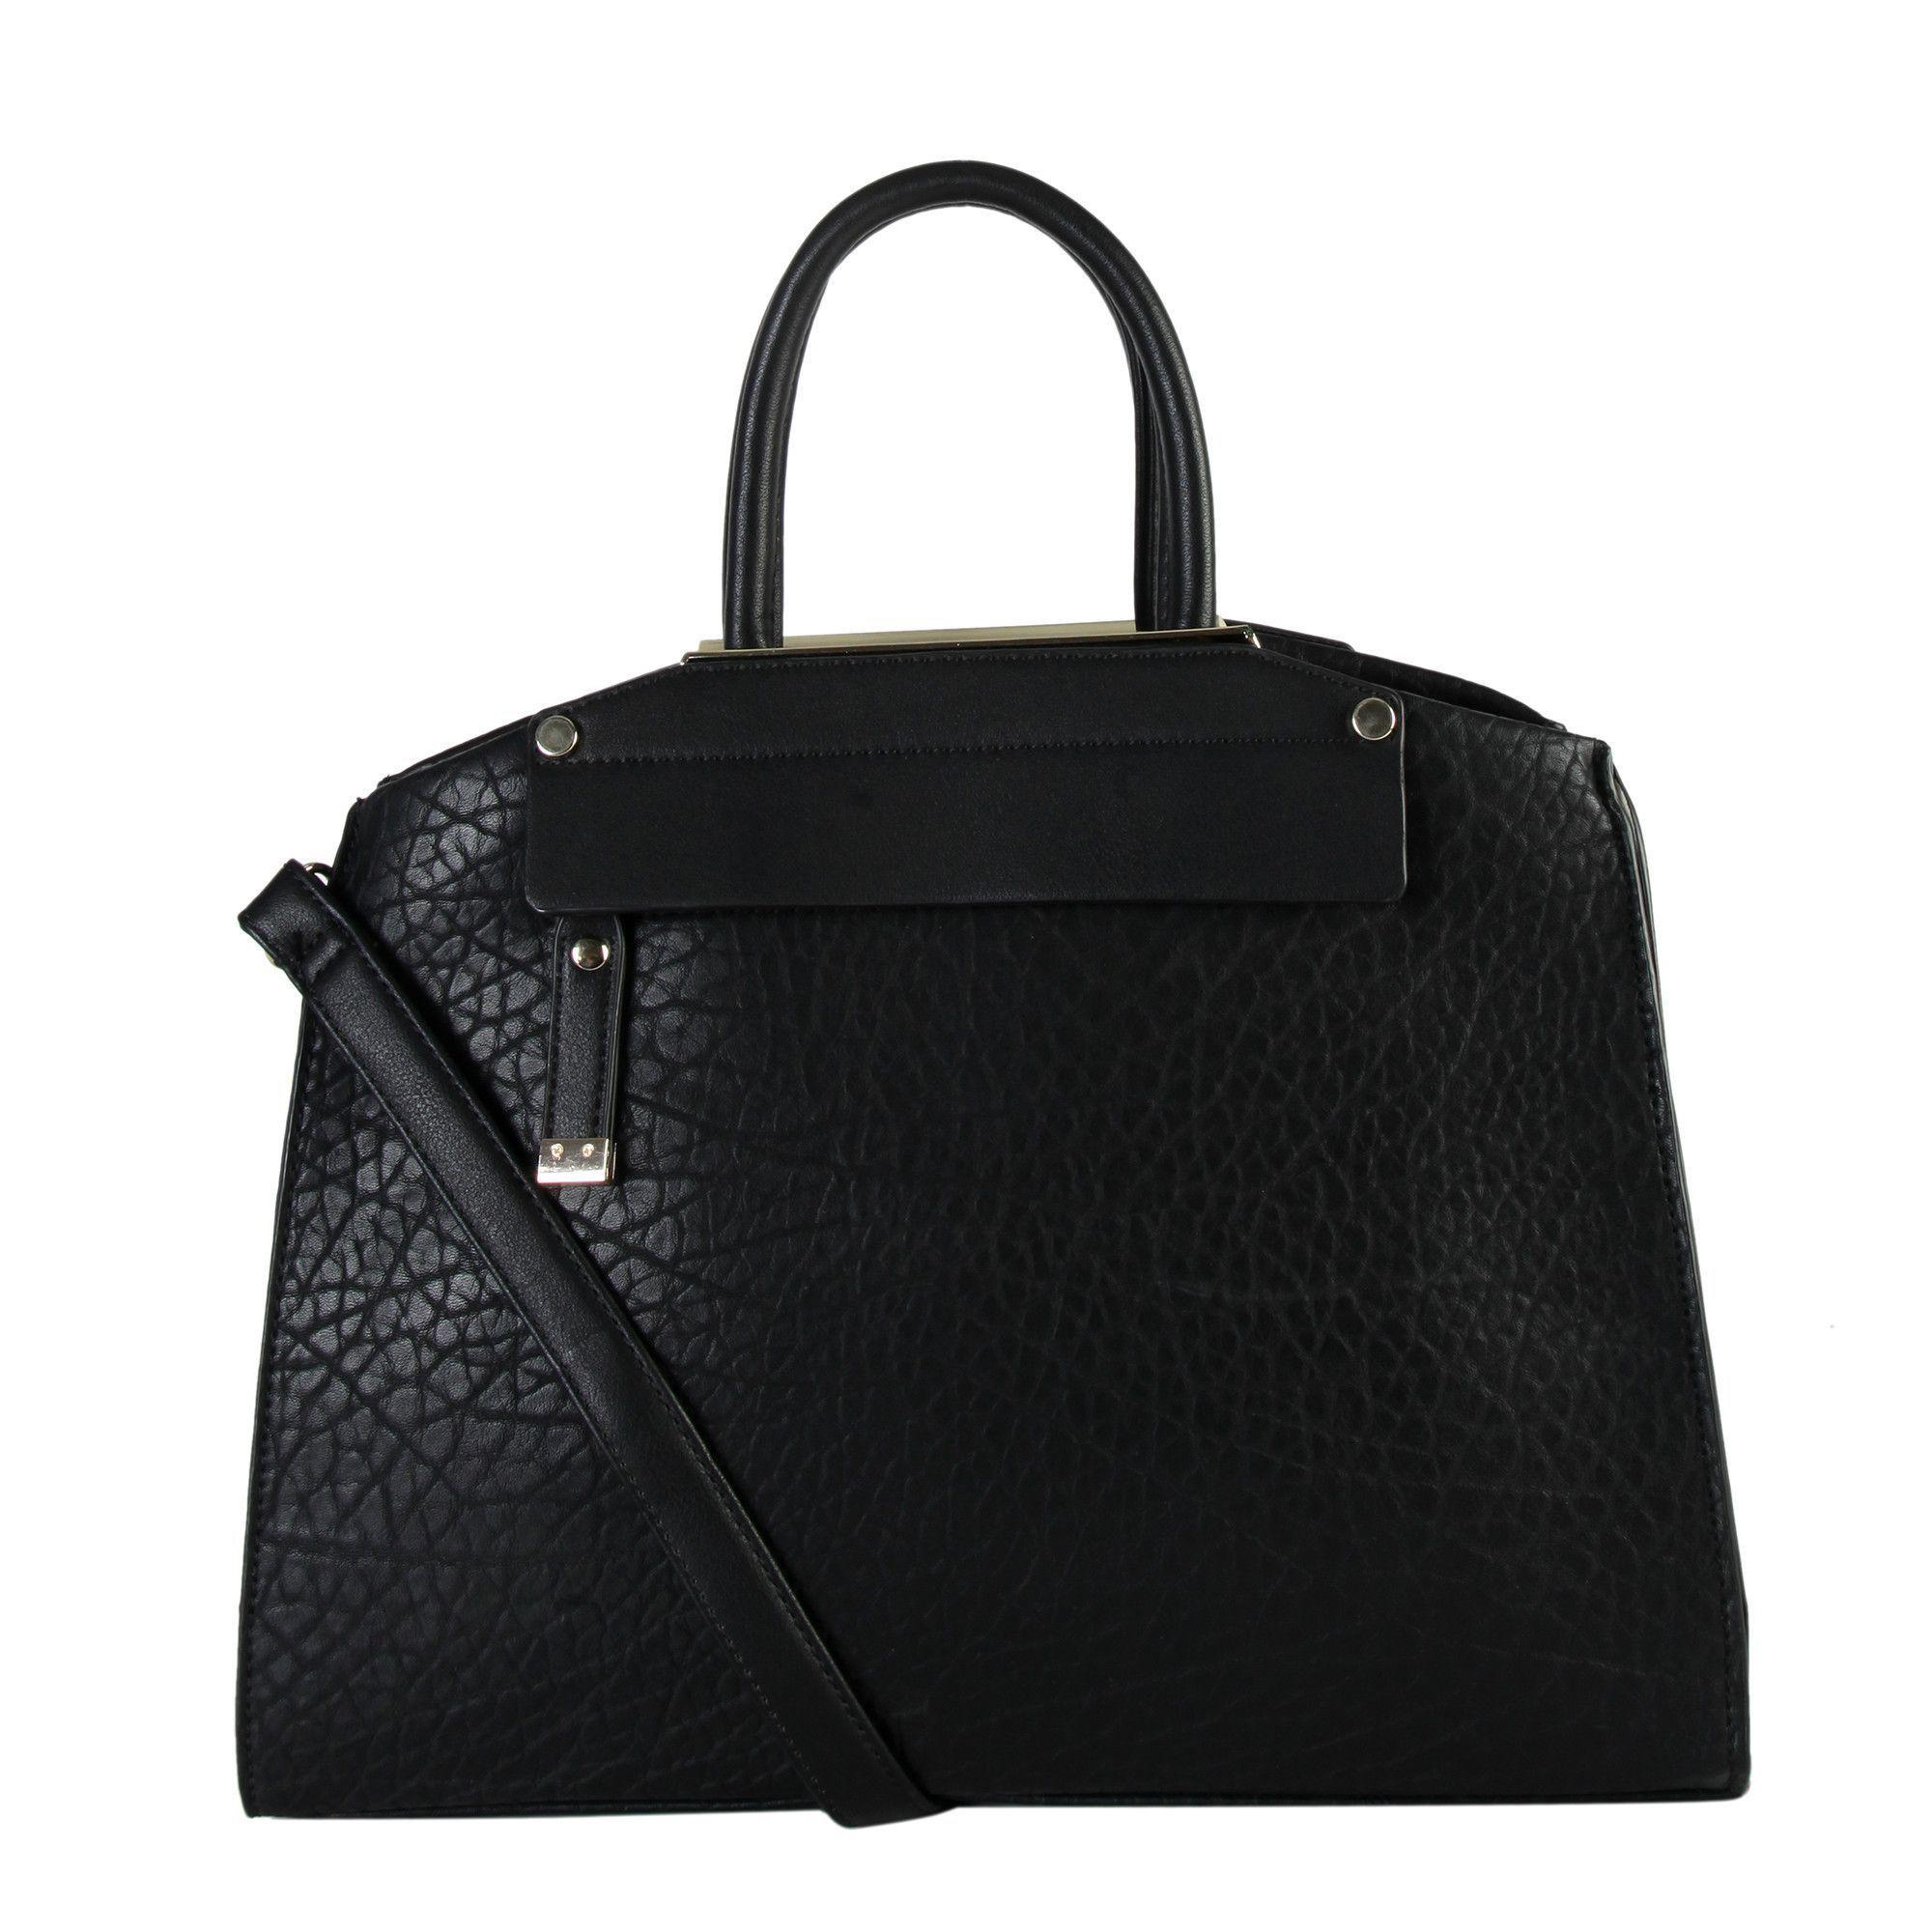 Diophy Women's Faux Divided Compartments Zipper-closure Tote Handbag